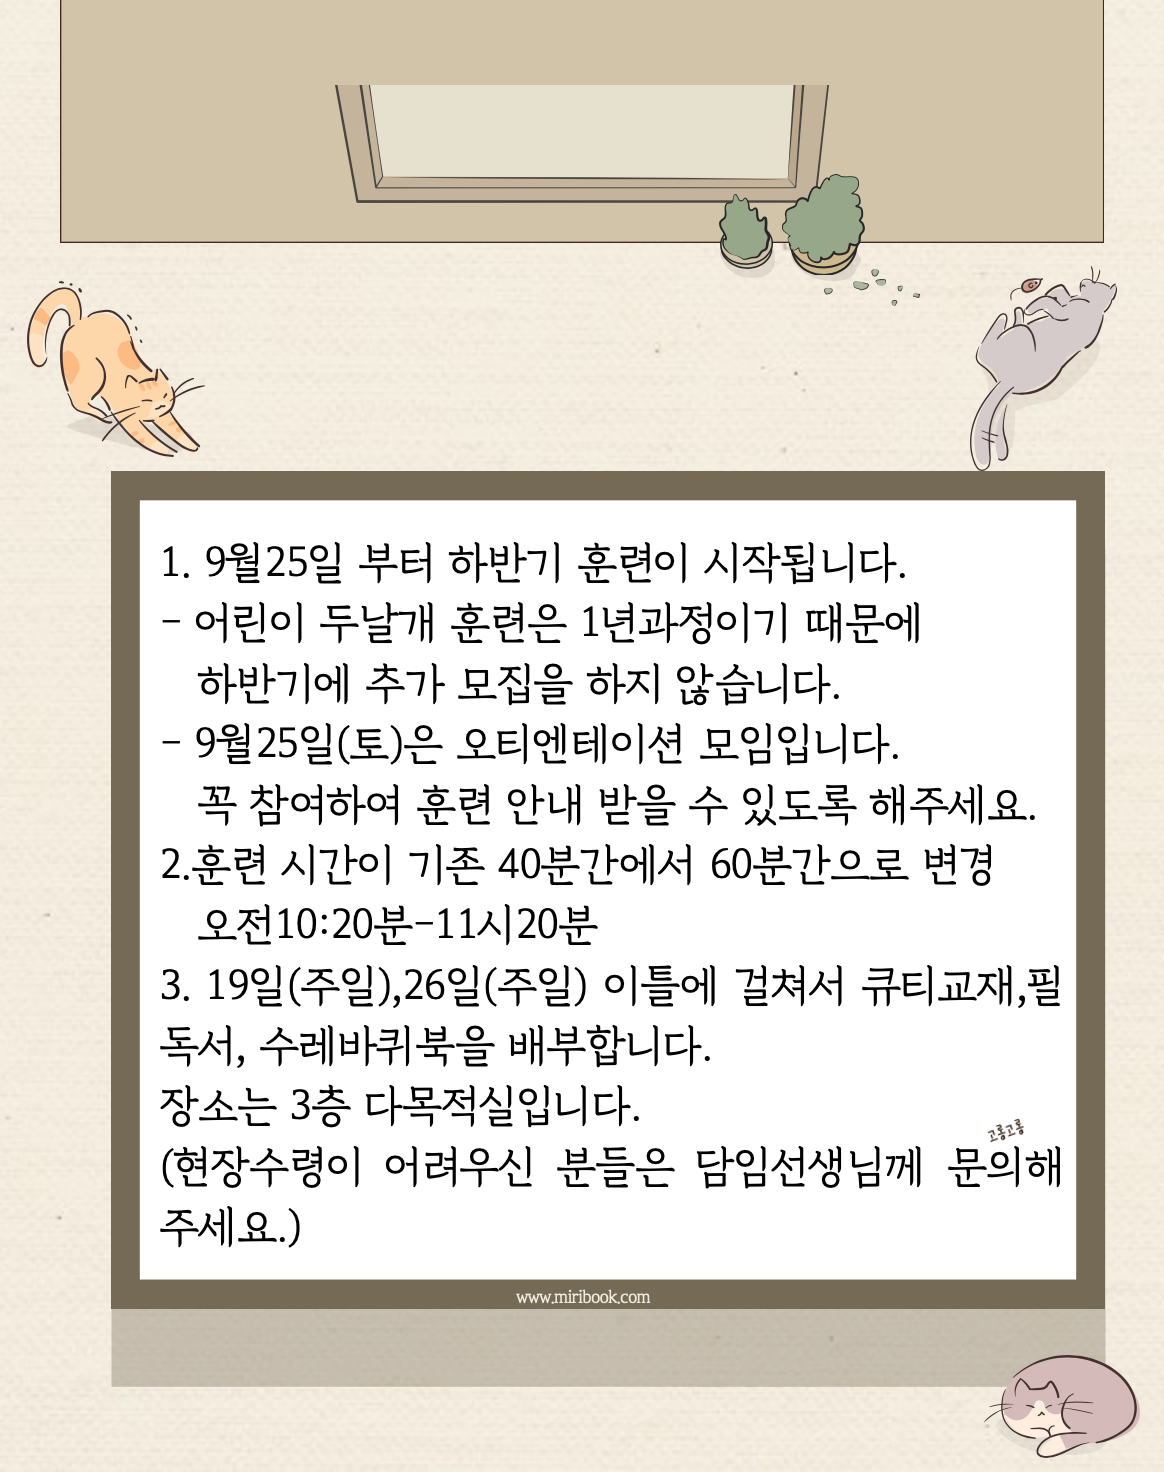 KakaoTalk_20210918_145938878_02.png